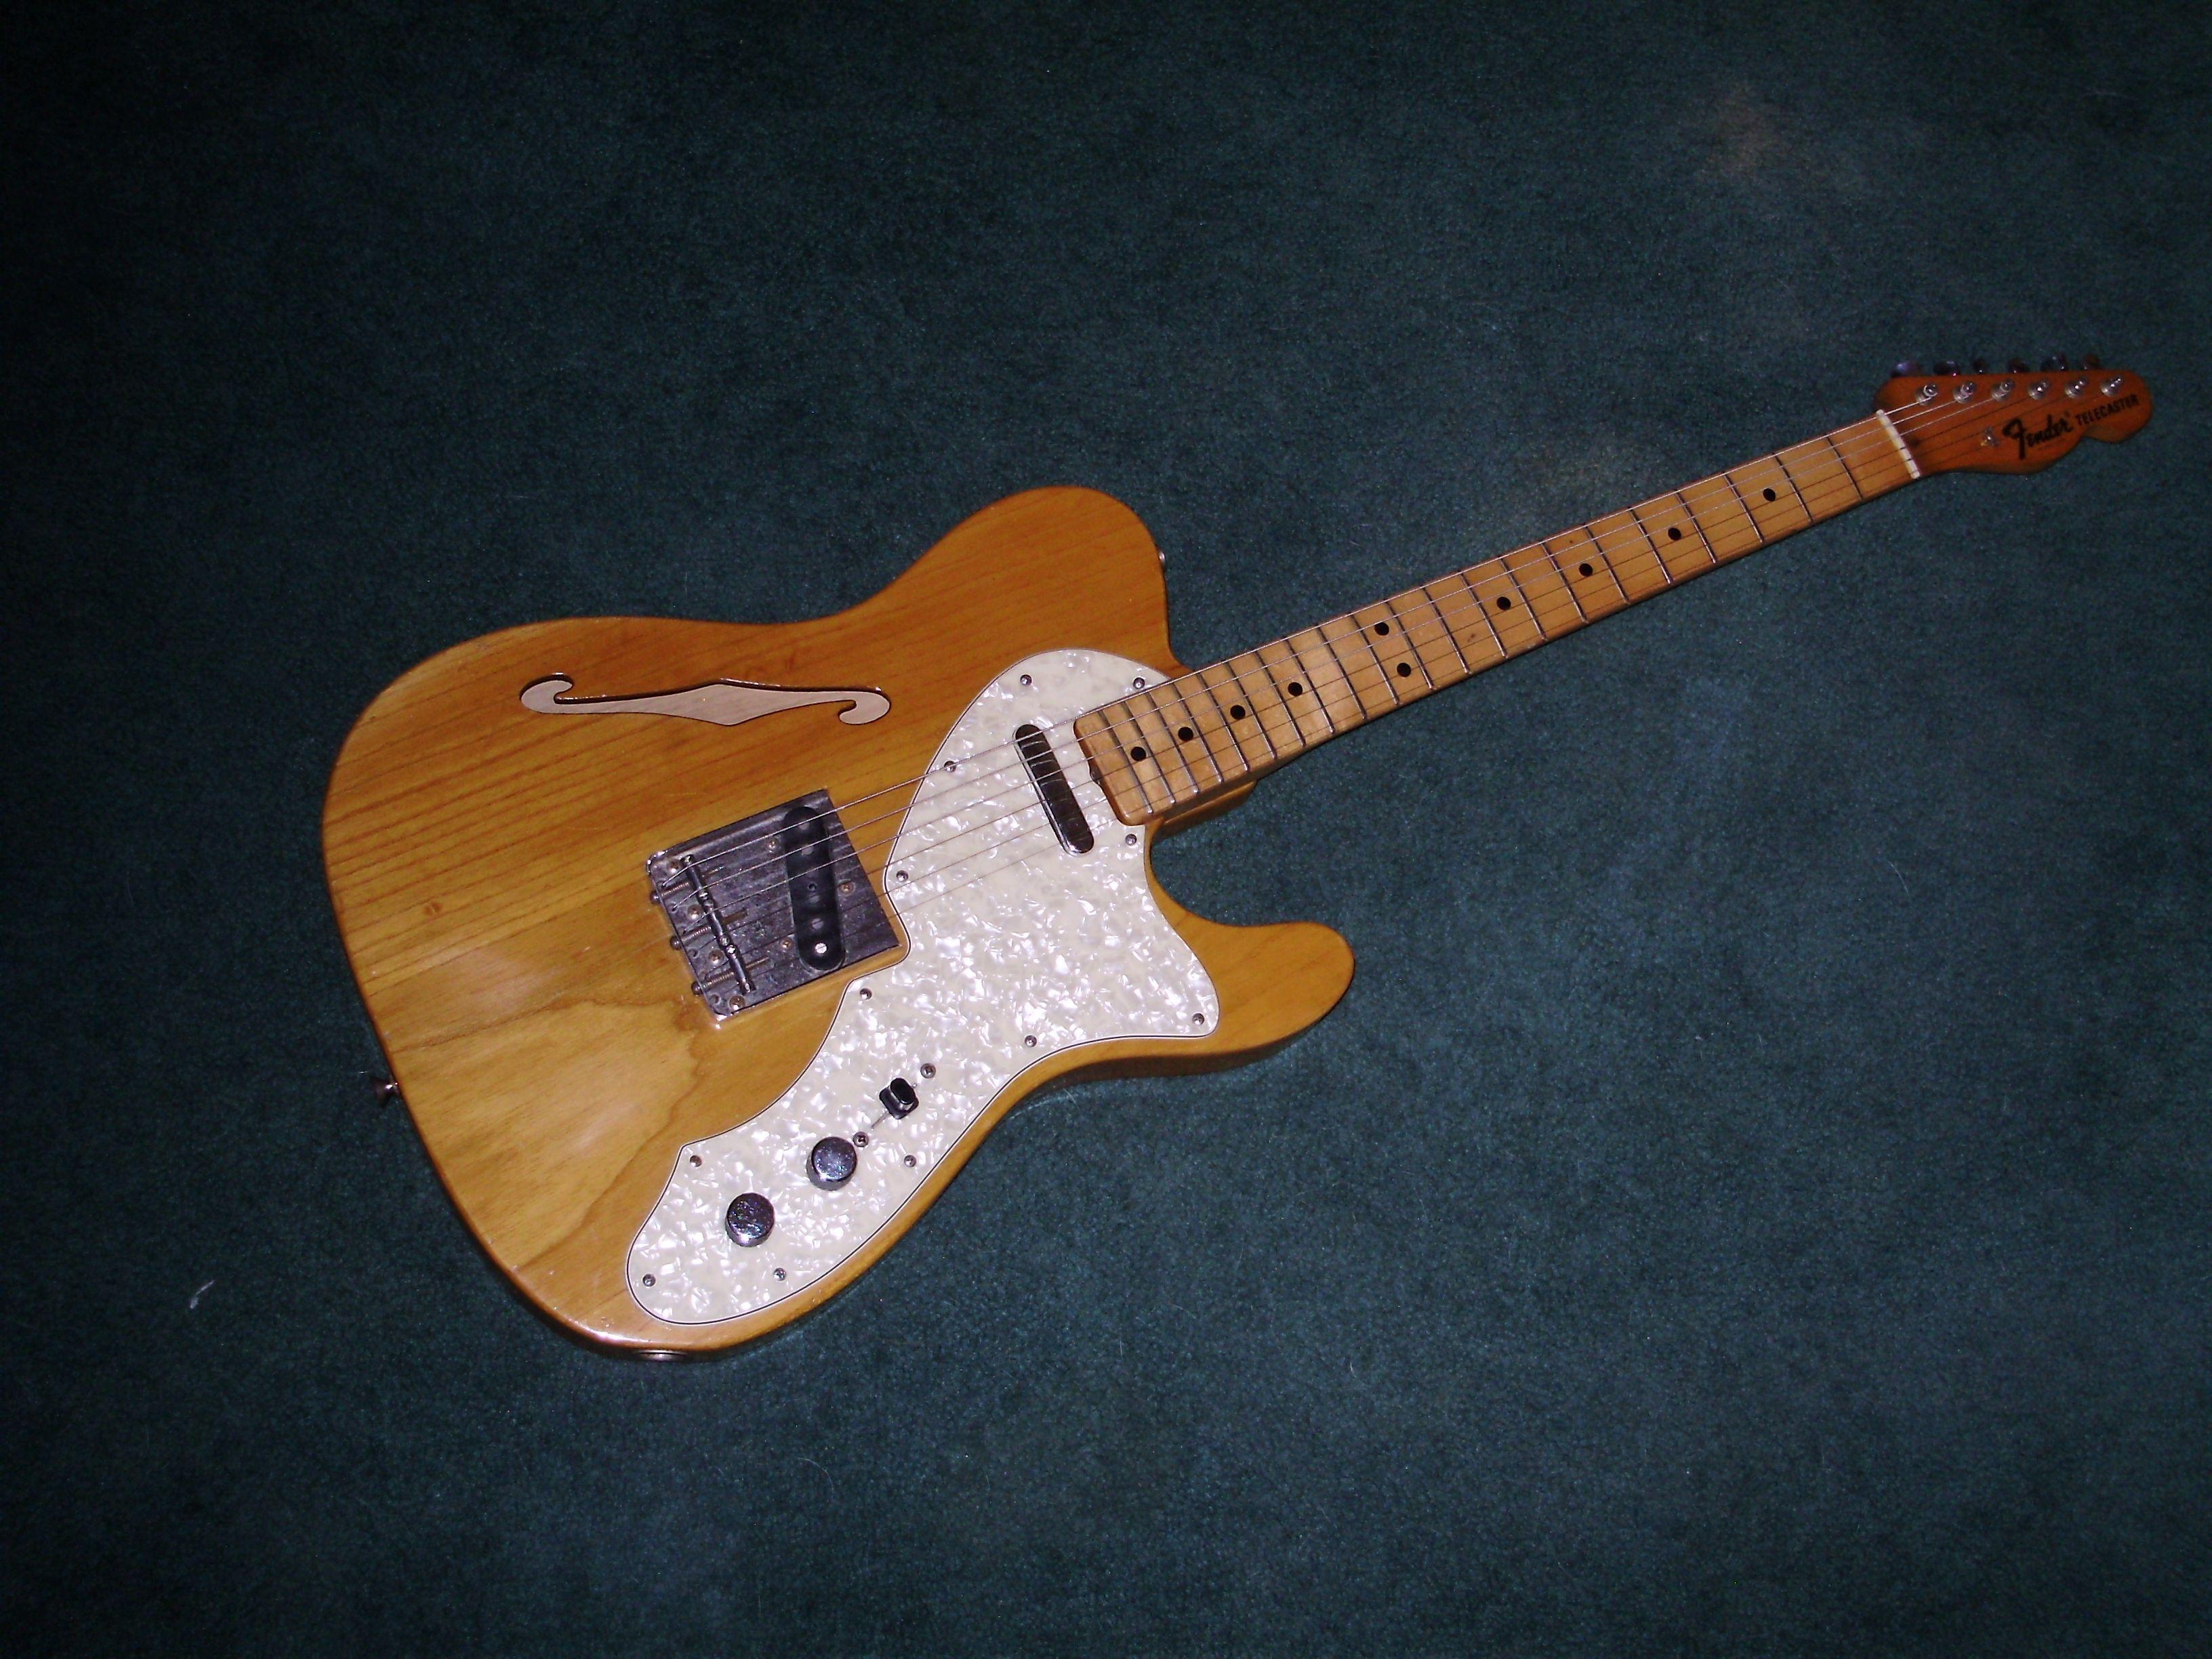 Fender telecaster thinline fender telecaster telecaster